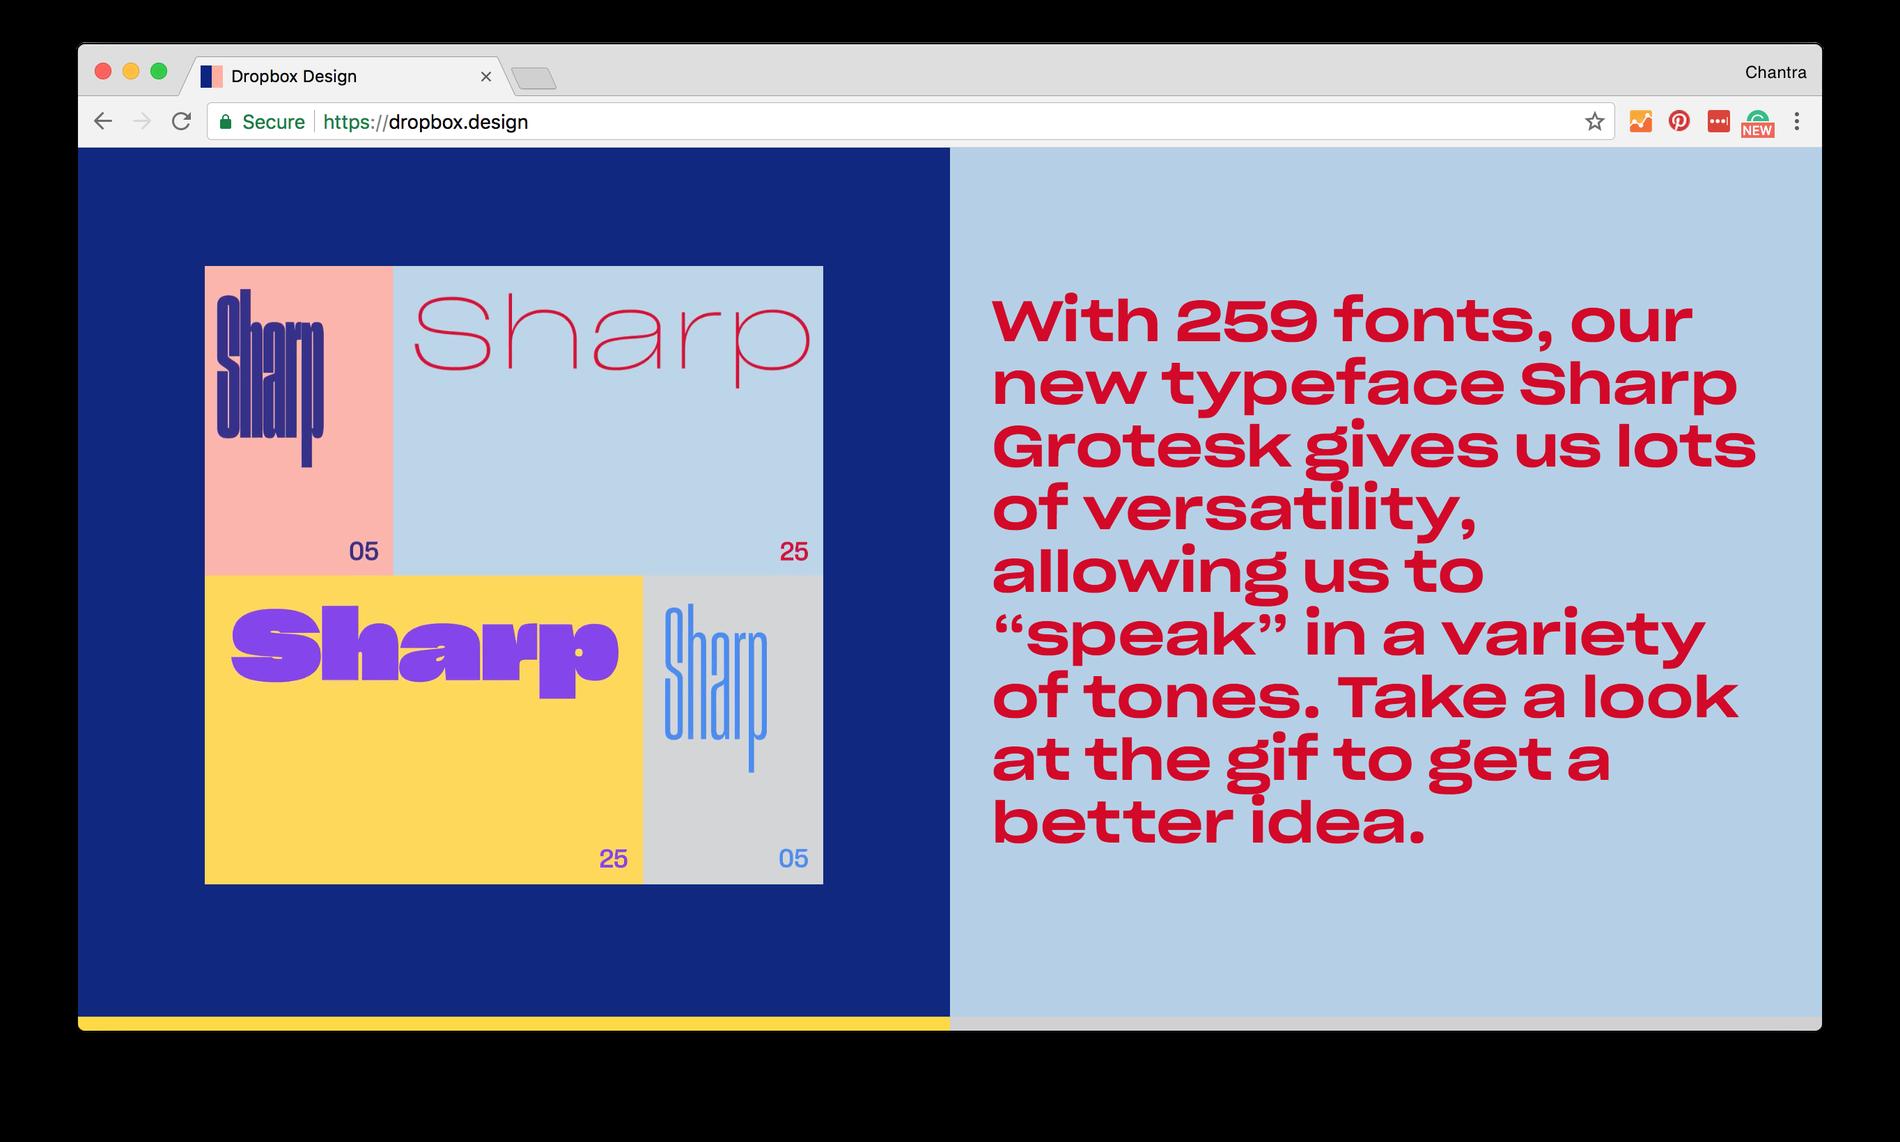 Sharp-Grotesk-Dropbox-Design-Web-6